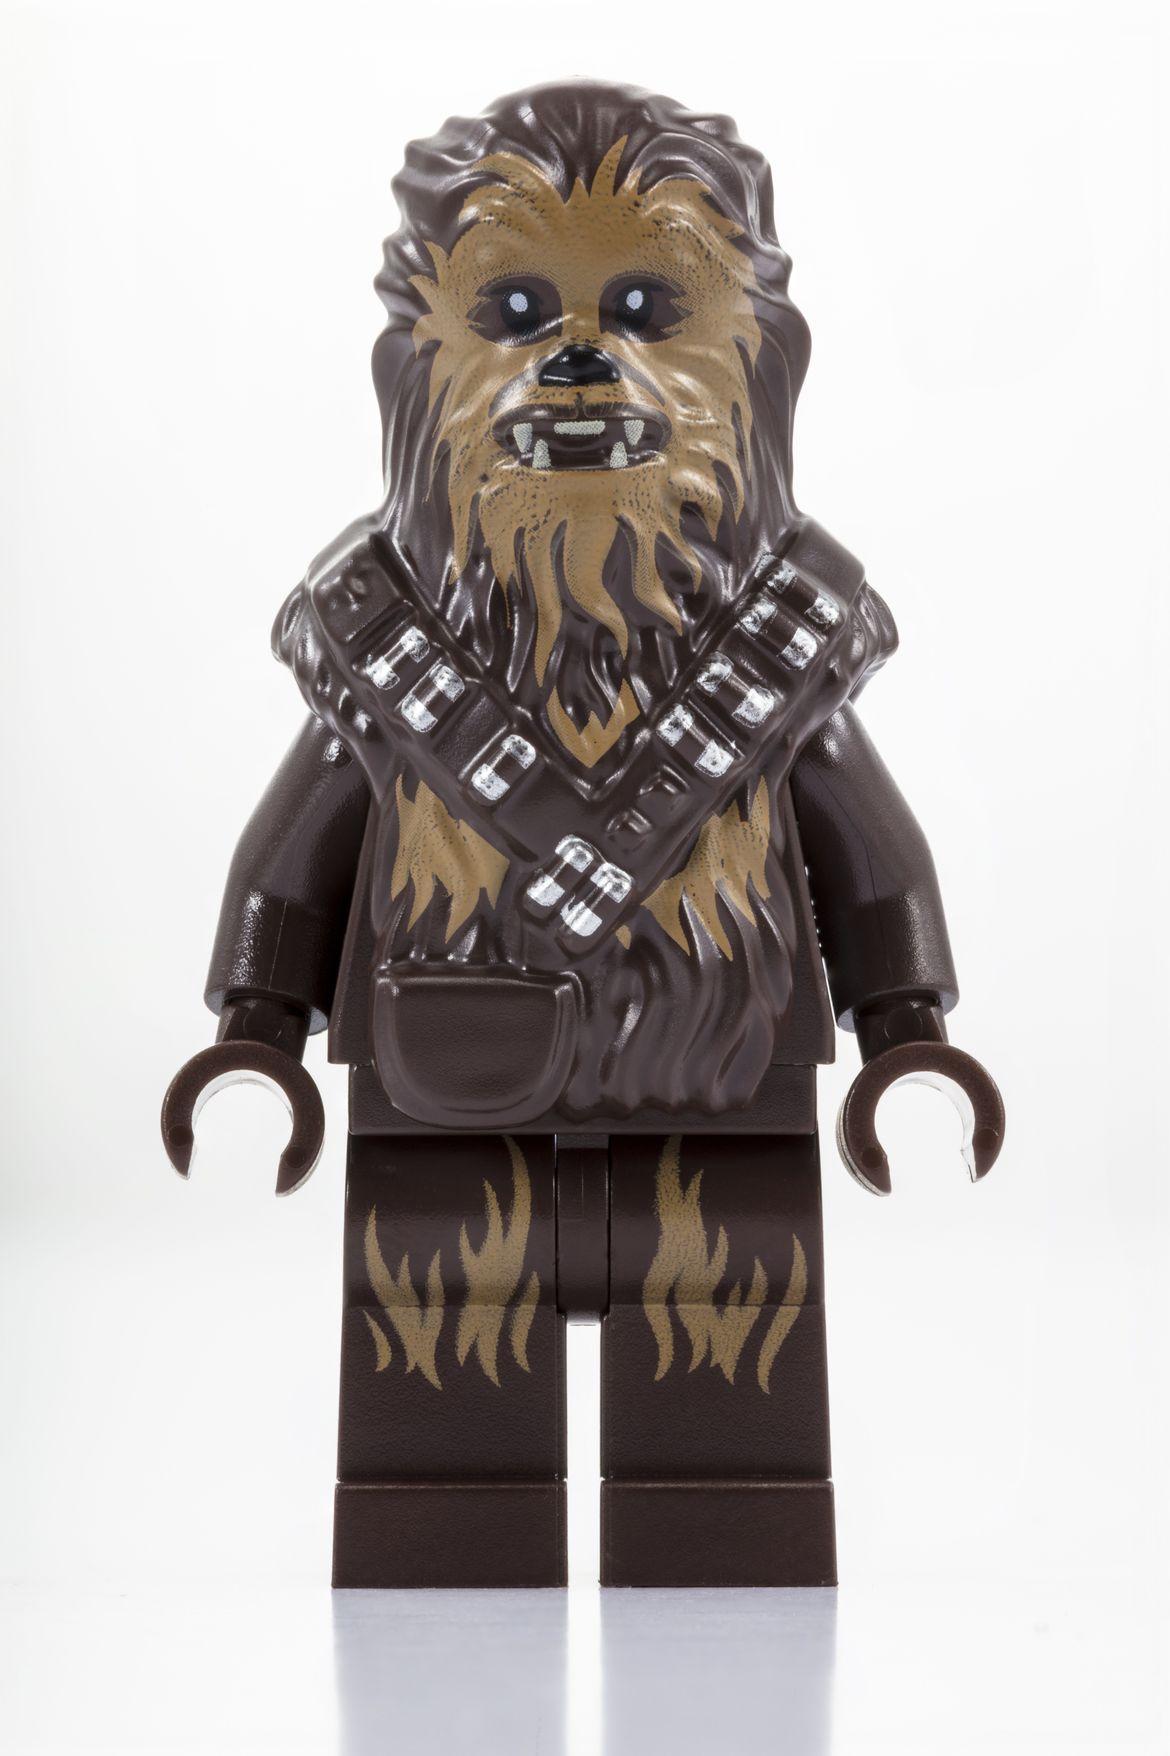 Millennium Falcon Cockpit_LEGO_SDCC_2018_Chewbacca